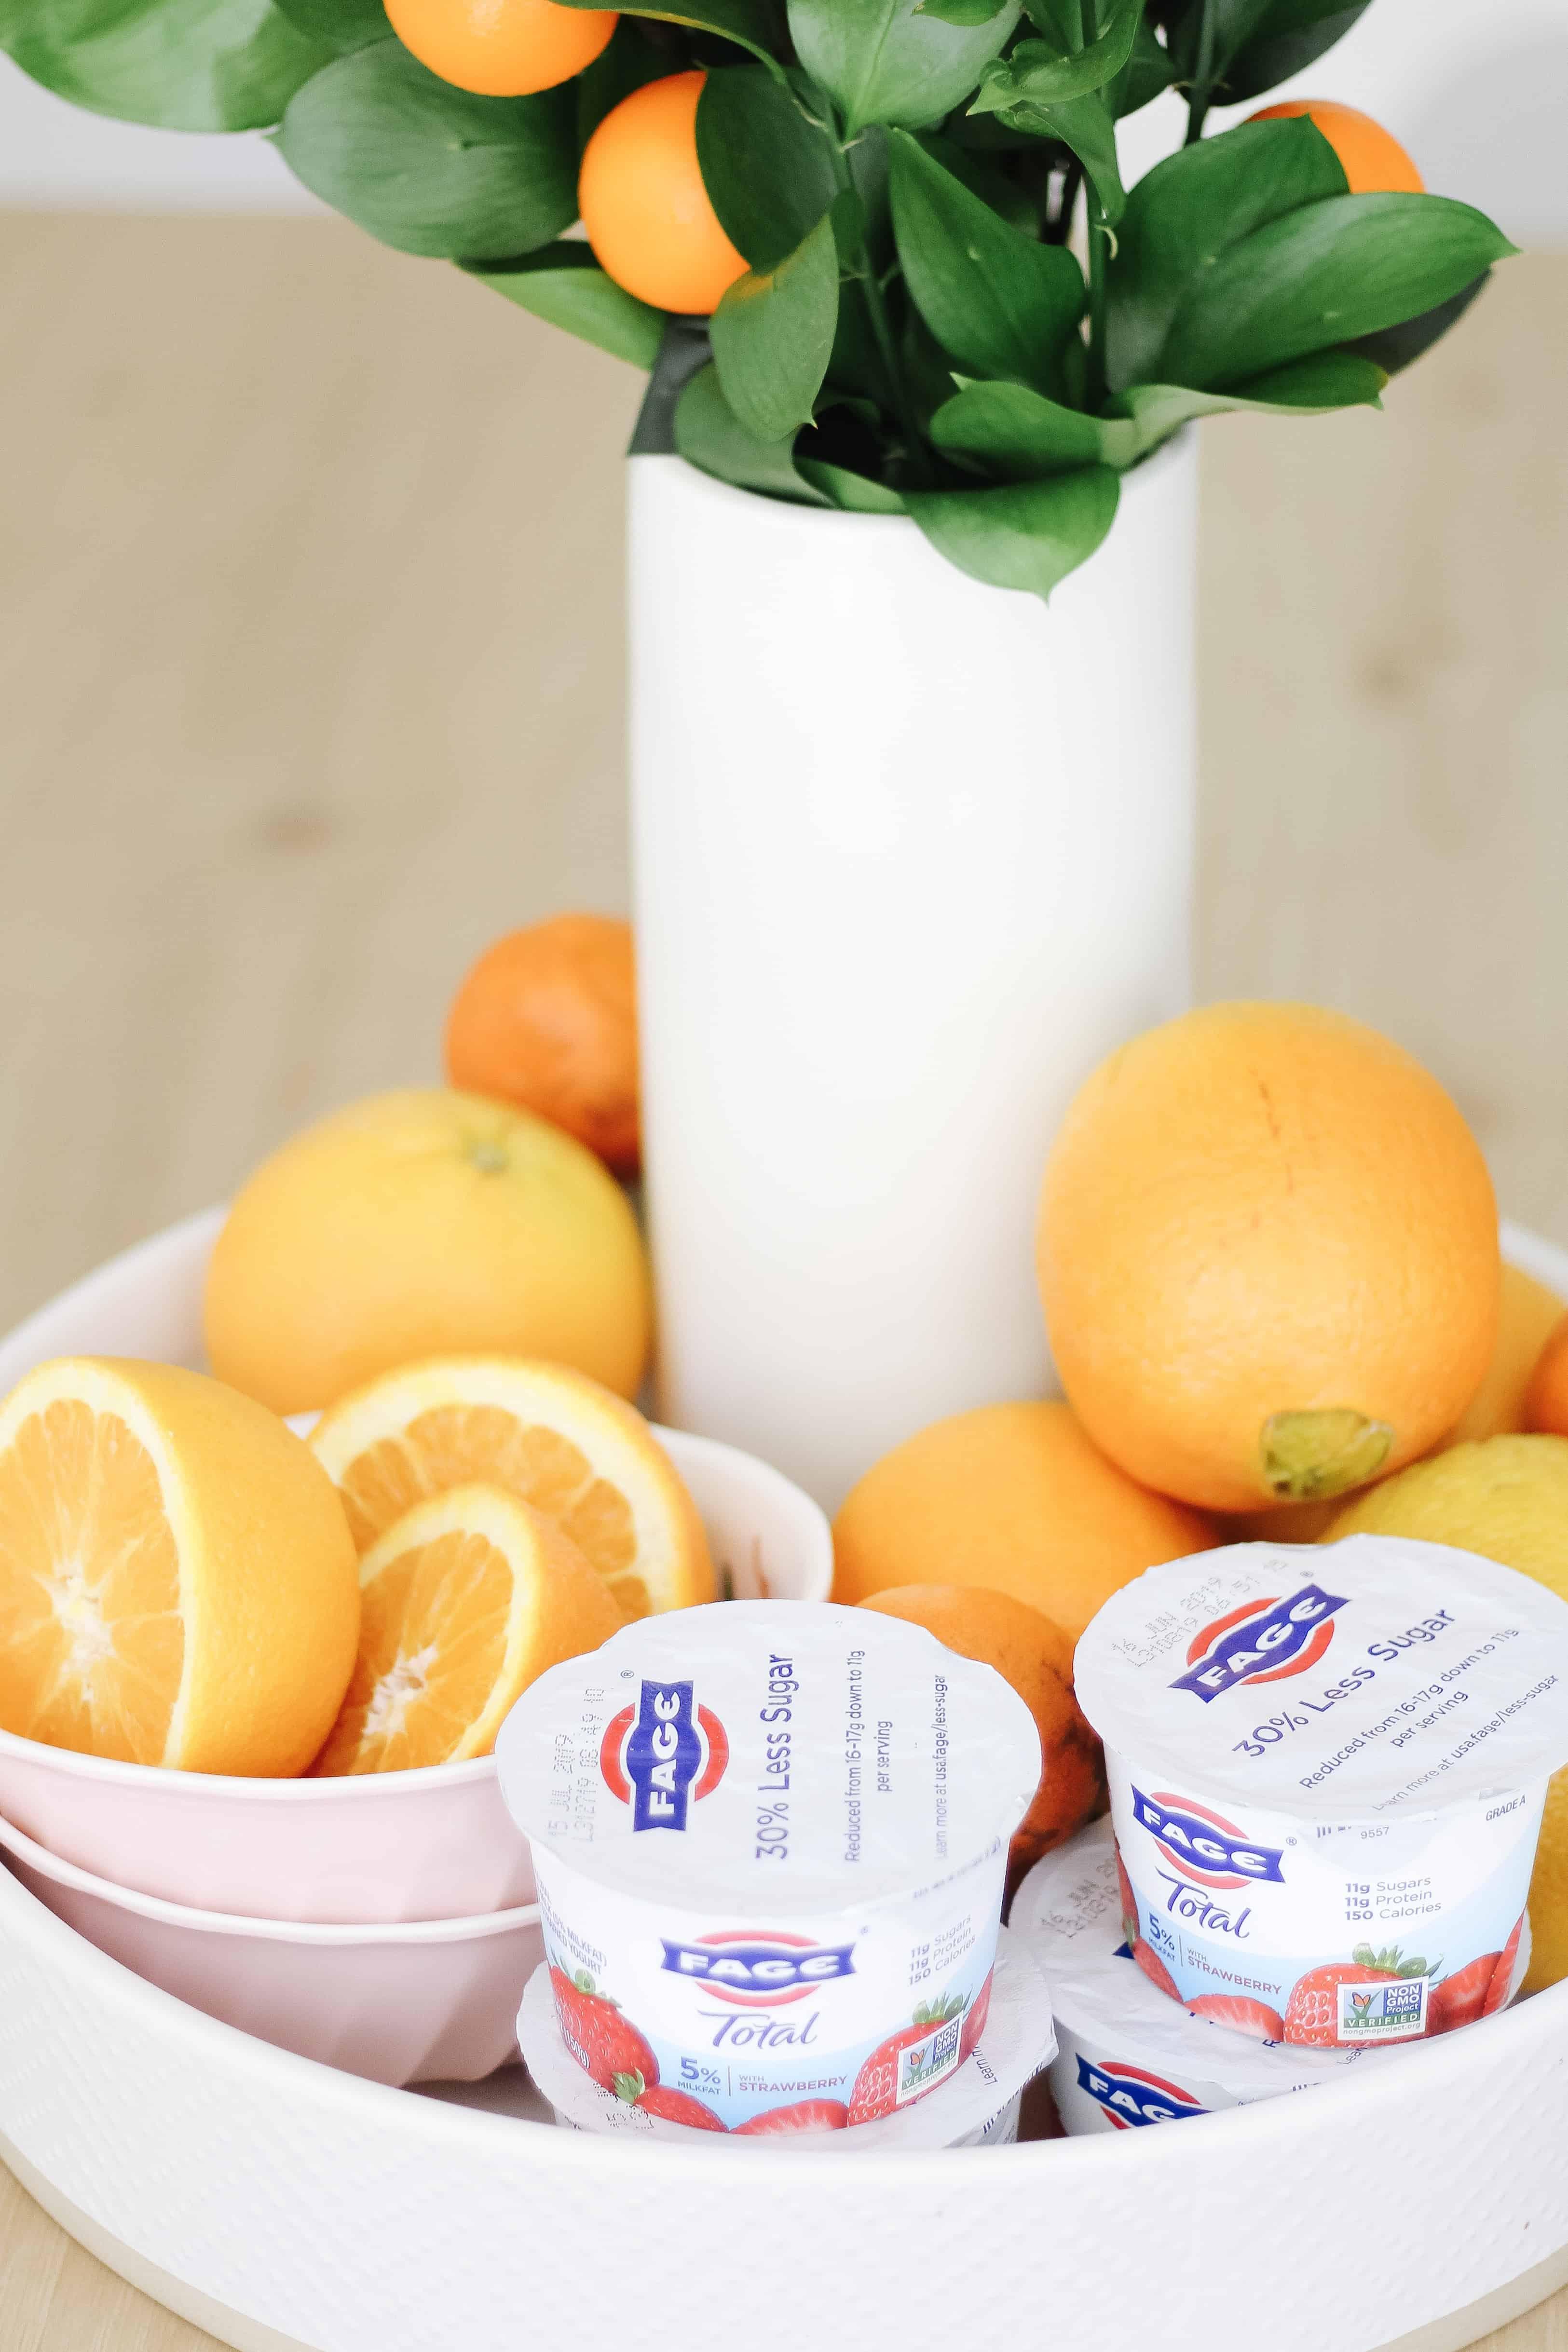 Fage yogurt on tray with oranges